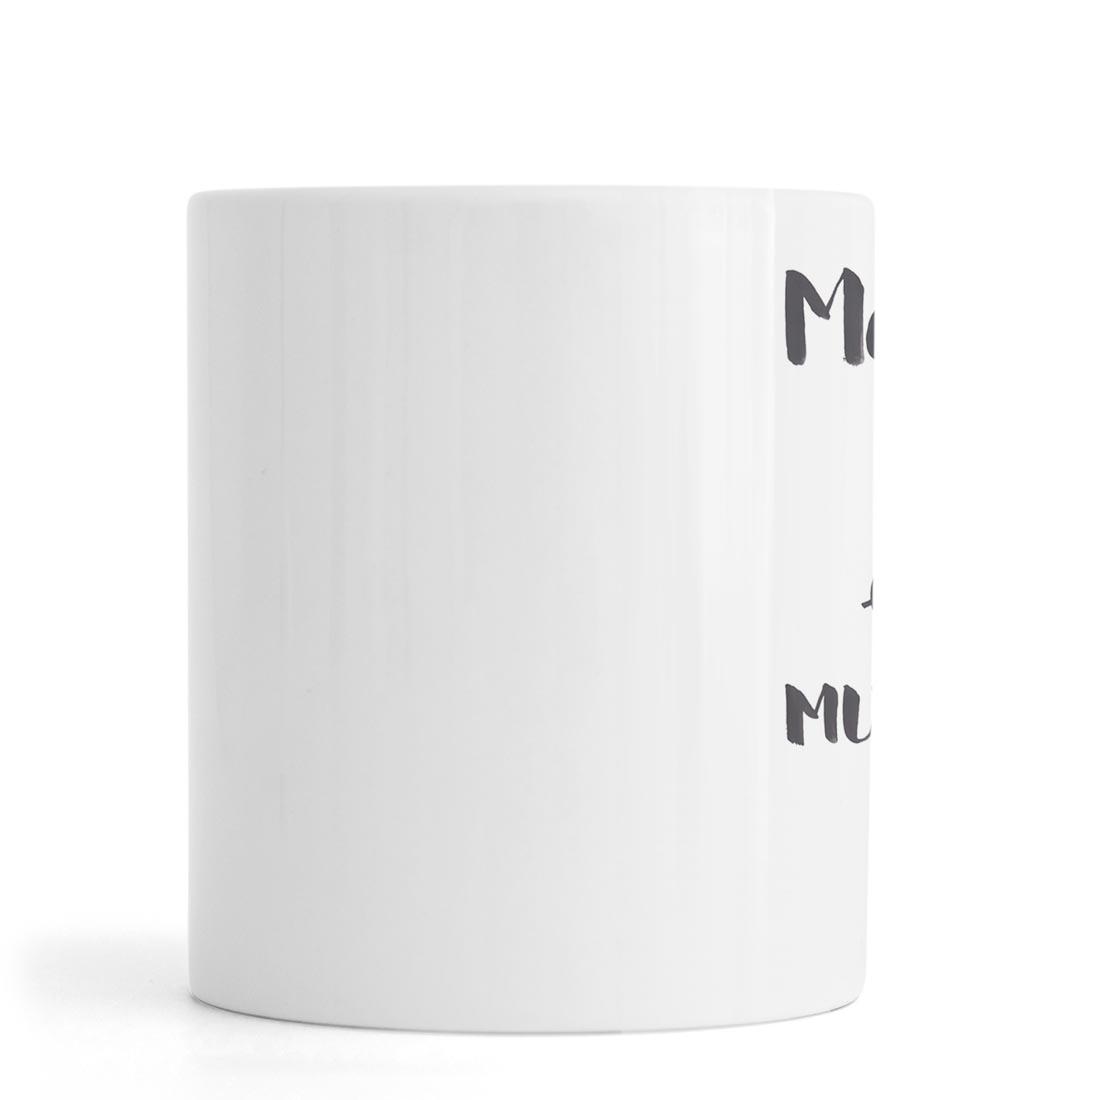 Mutausbruch As Mug By Brushmeetspaper | JUNIQE